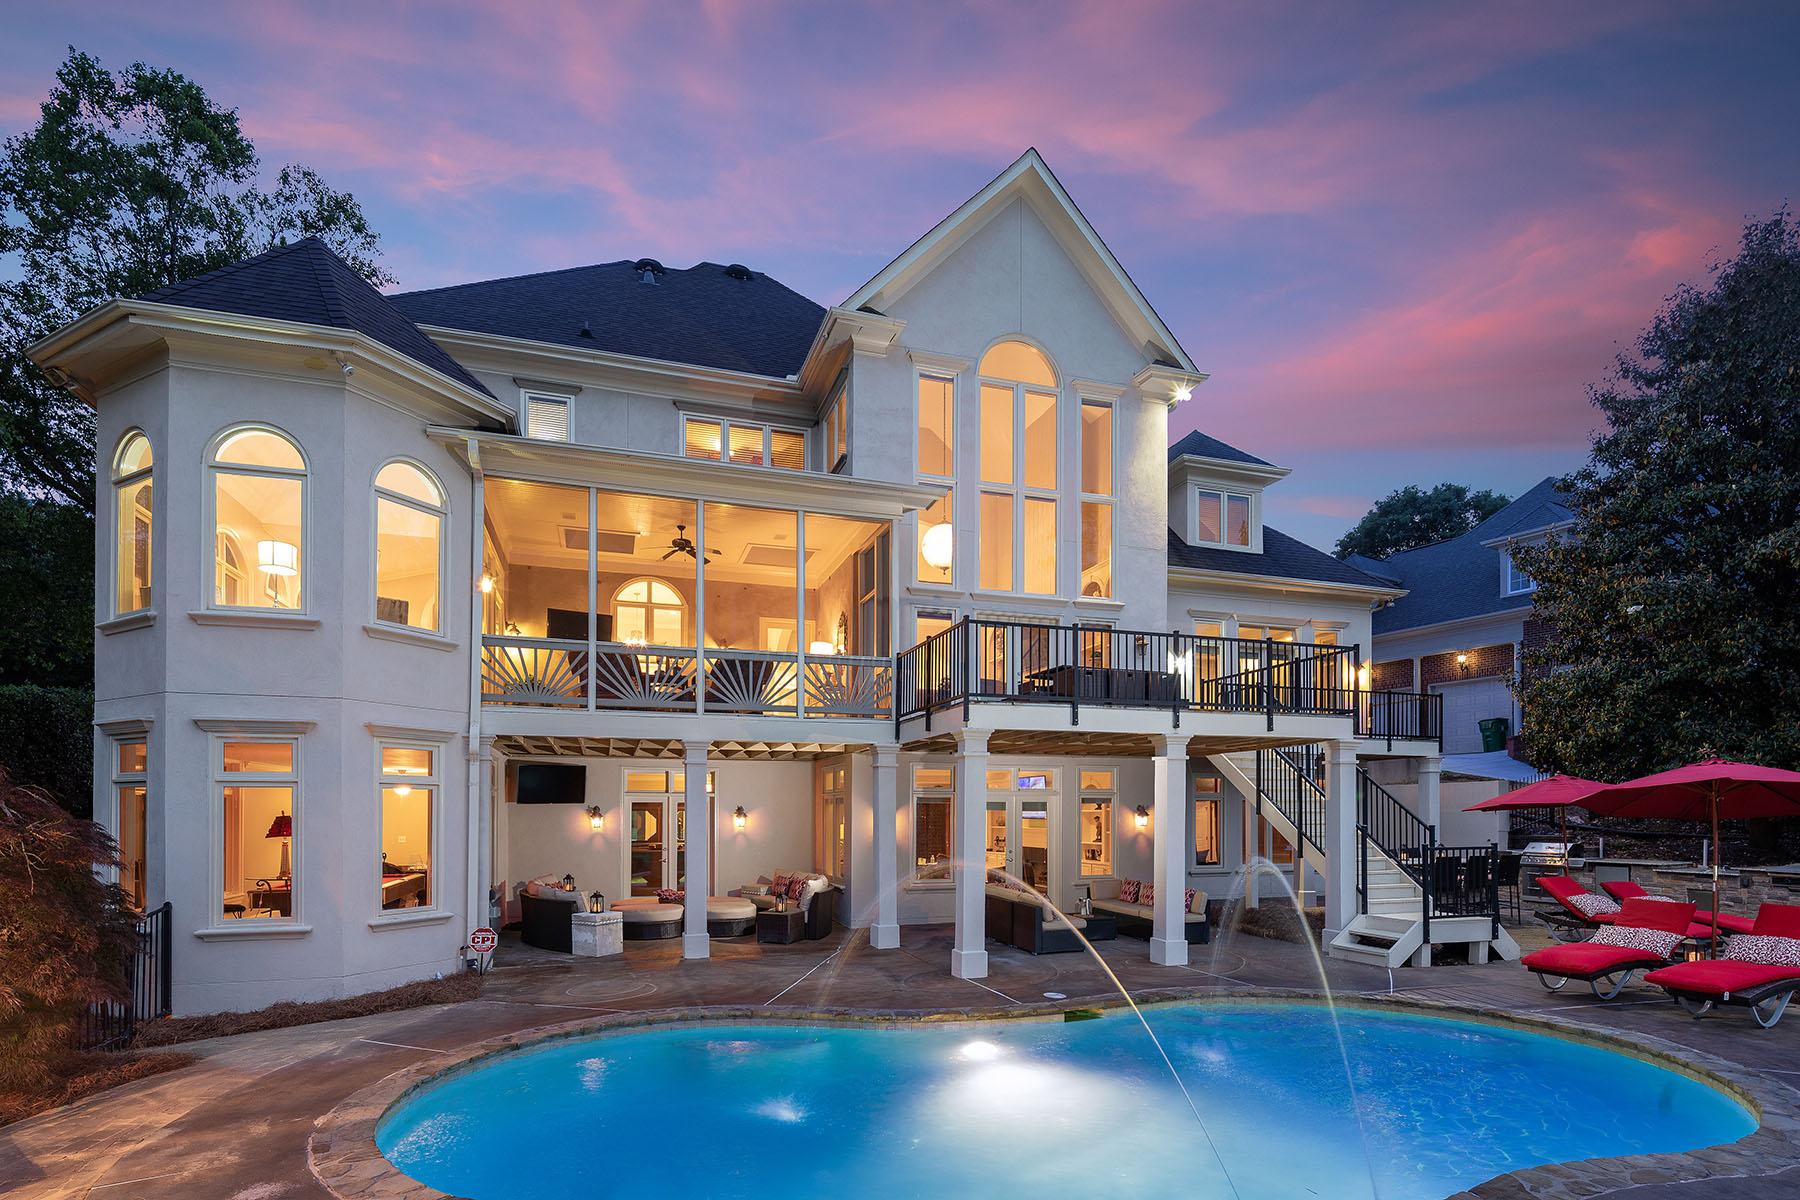 Single Family Homes for Active at 4417 Piper Glen Dr Charlotte, North Carolina 28277 United States